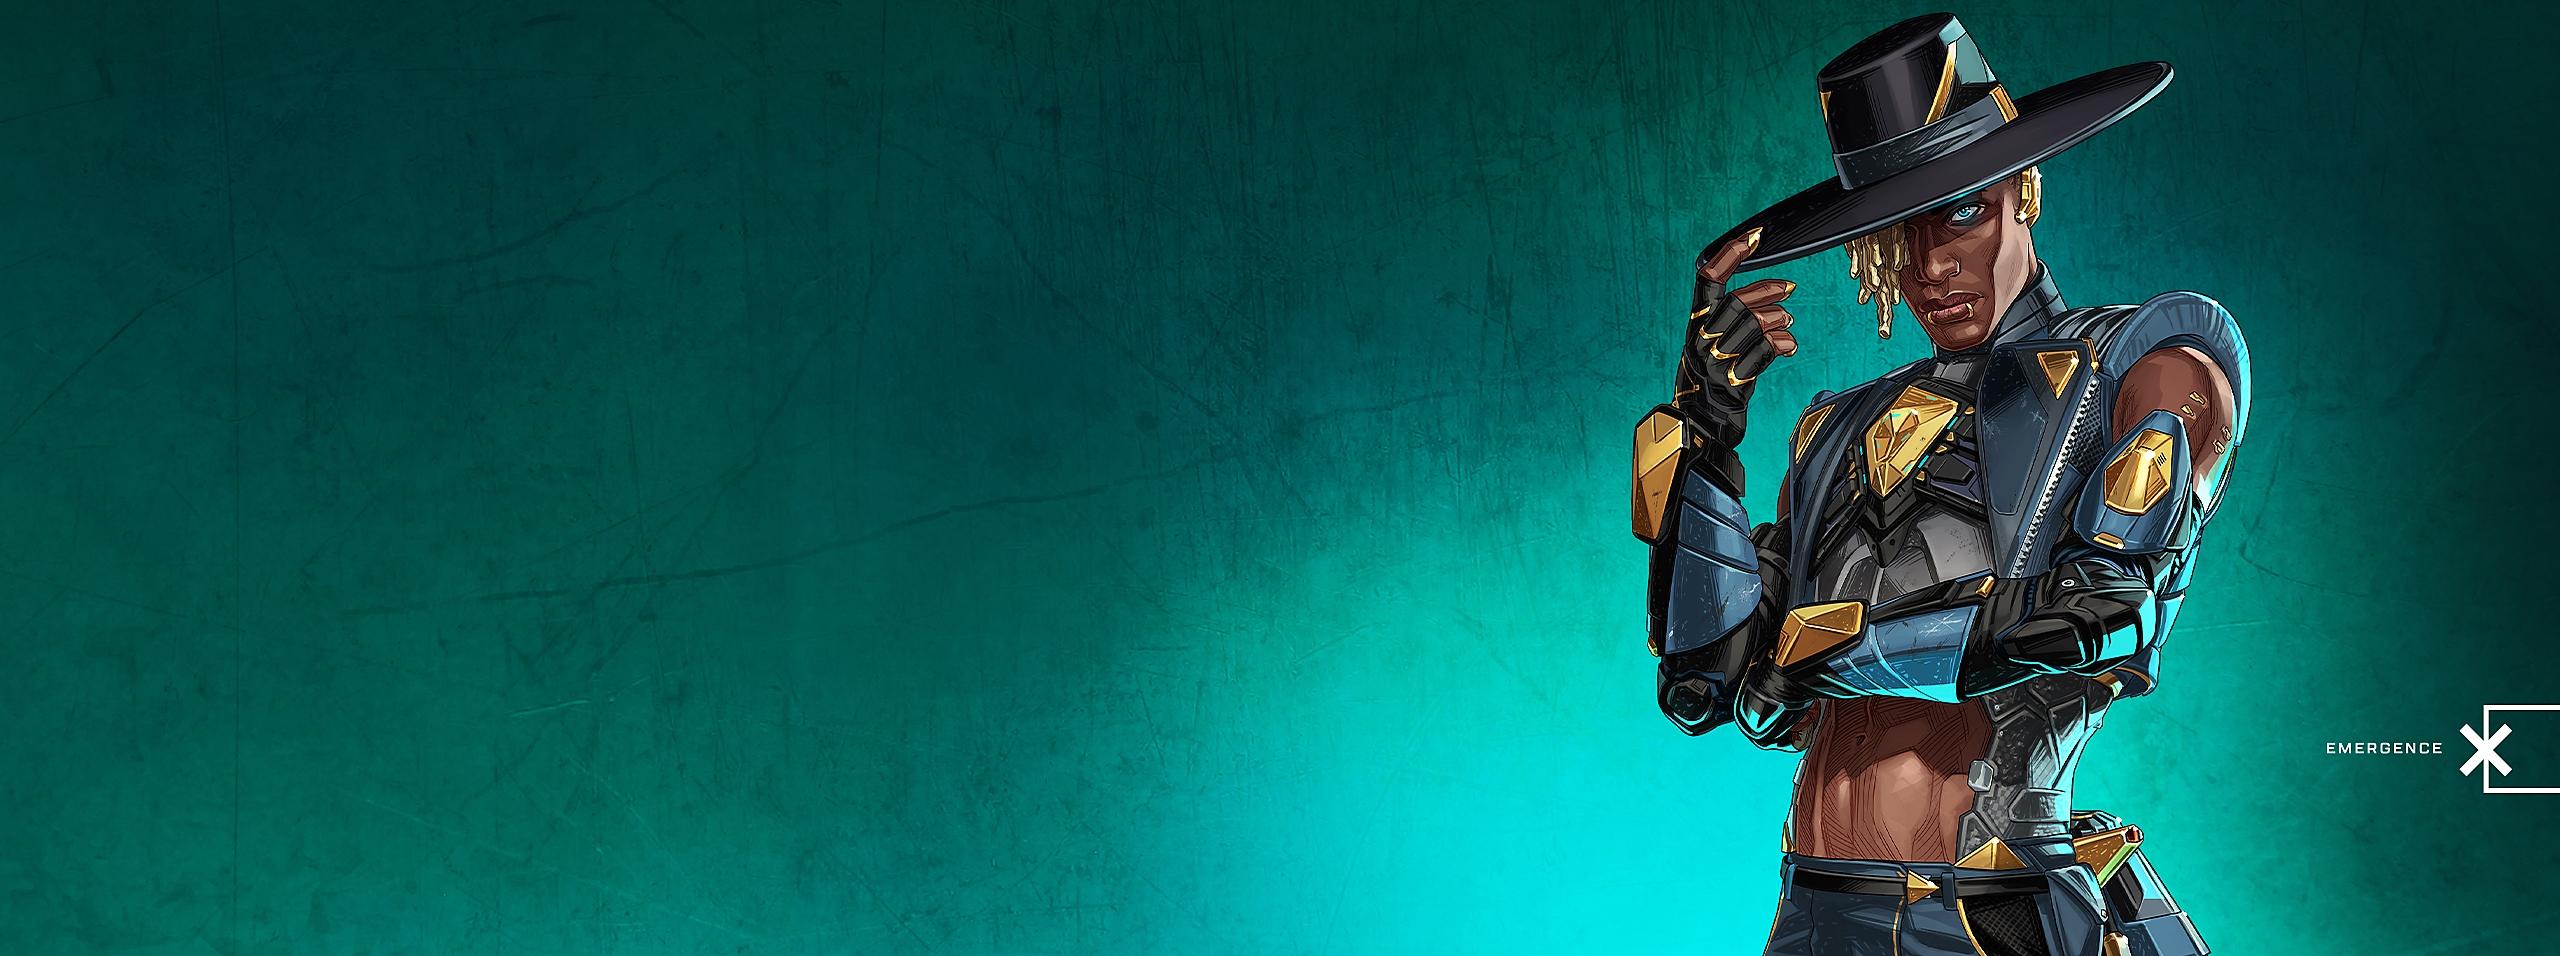 APEX Legends: Season 10 - Key Art